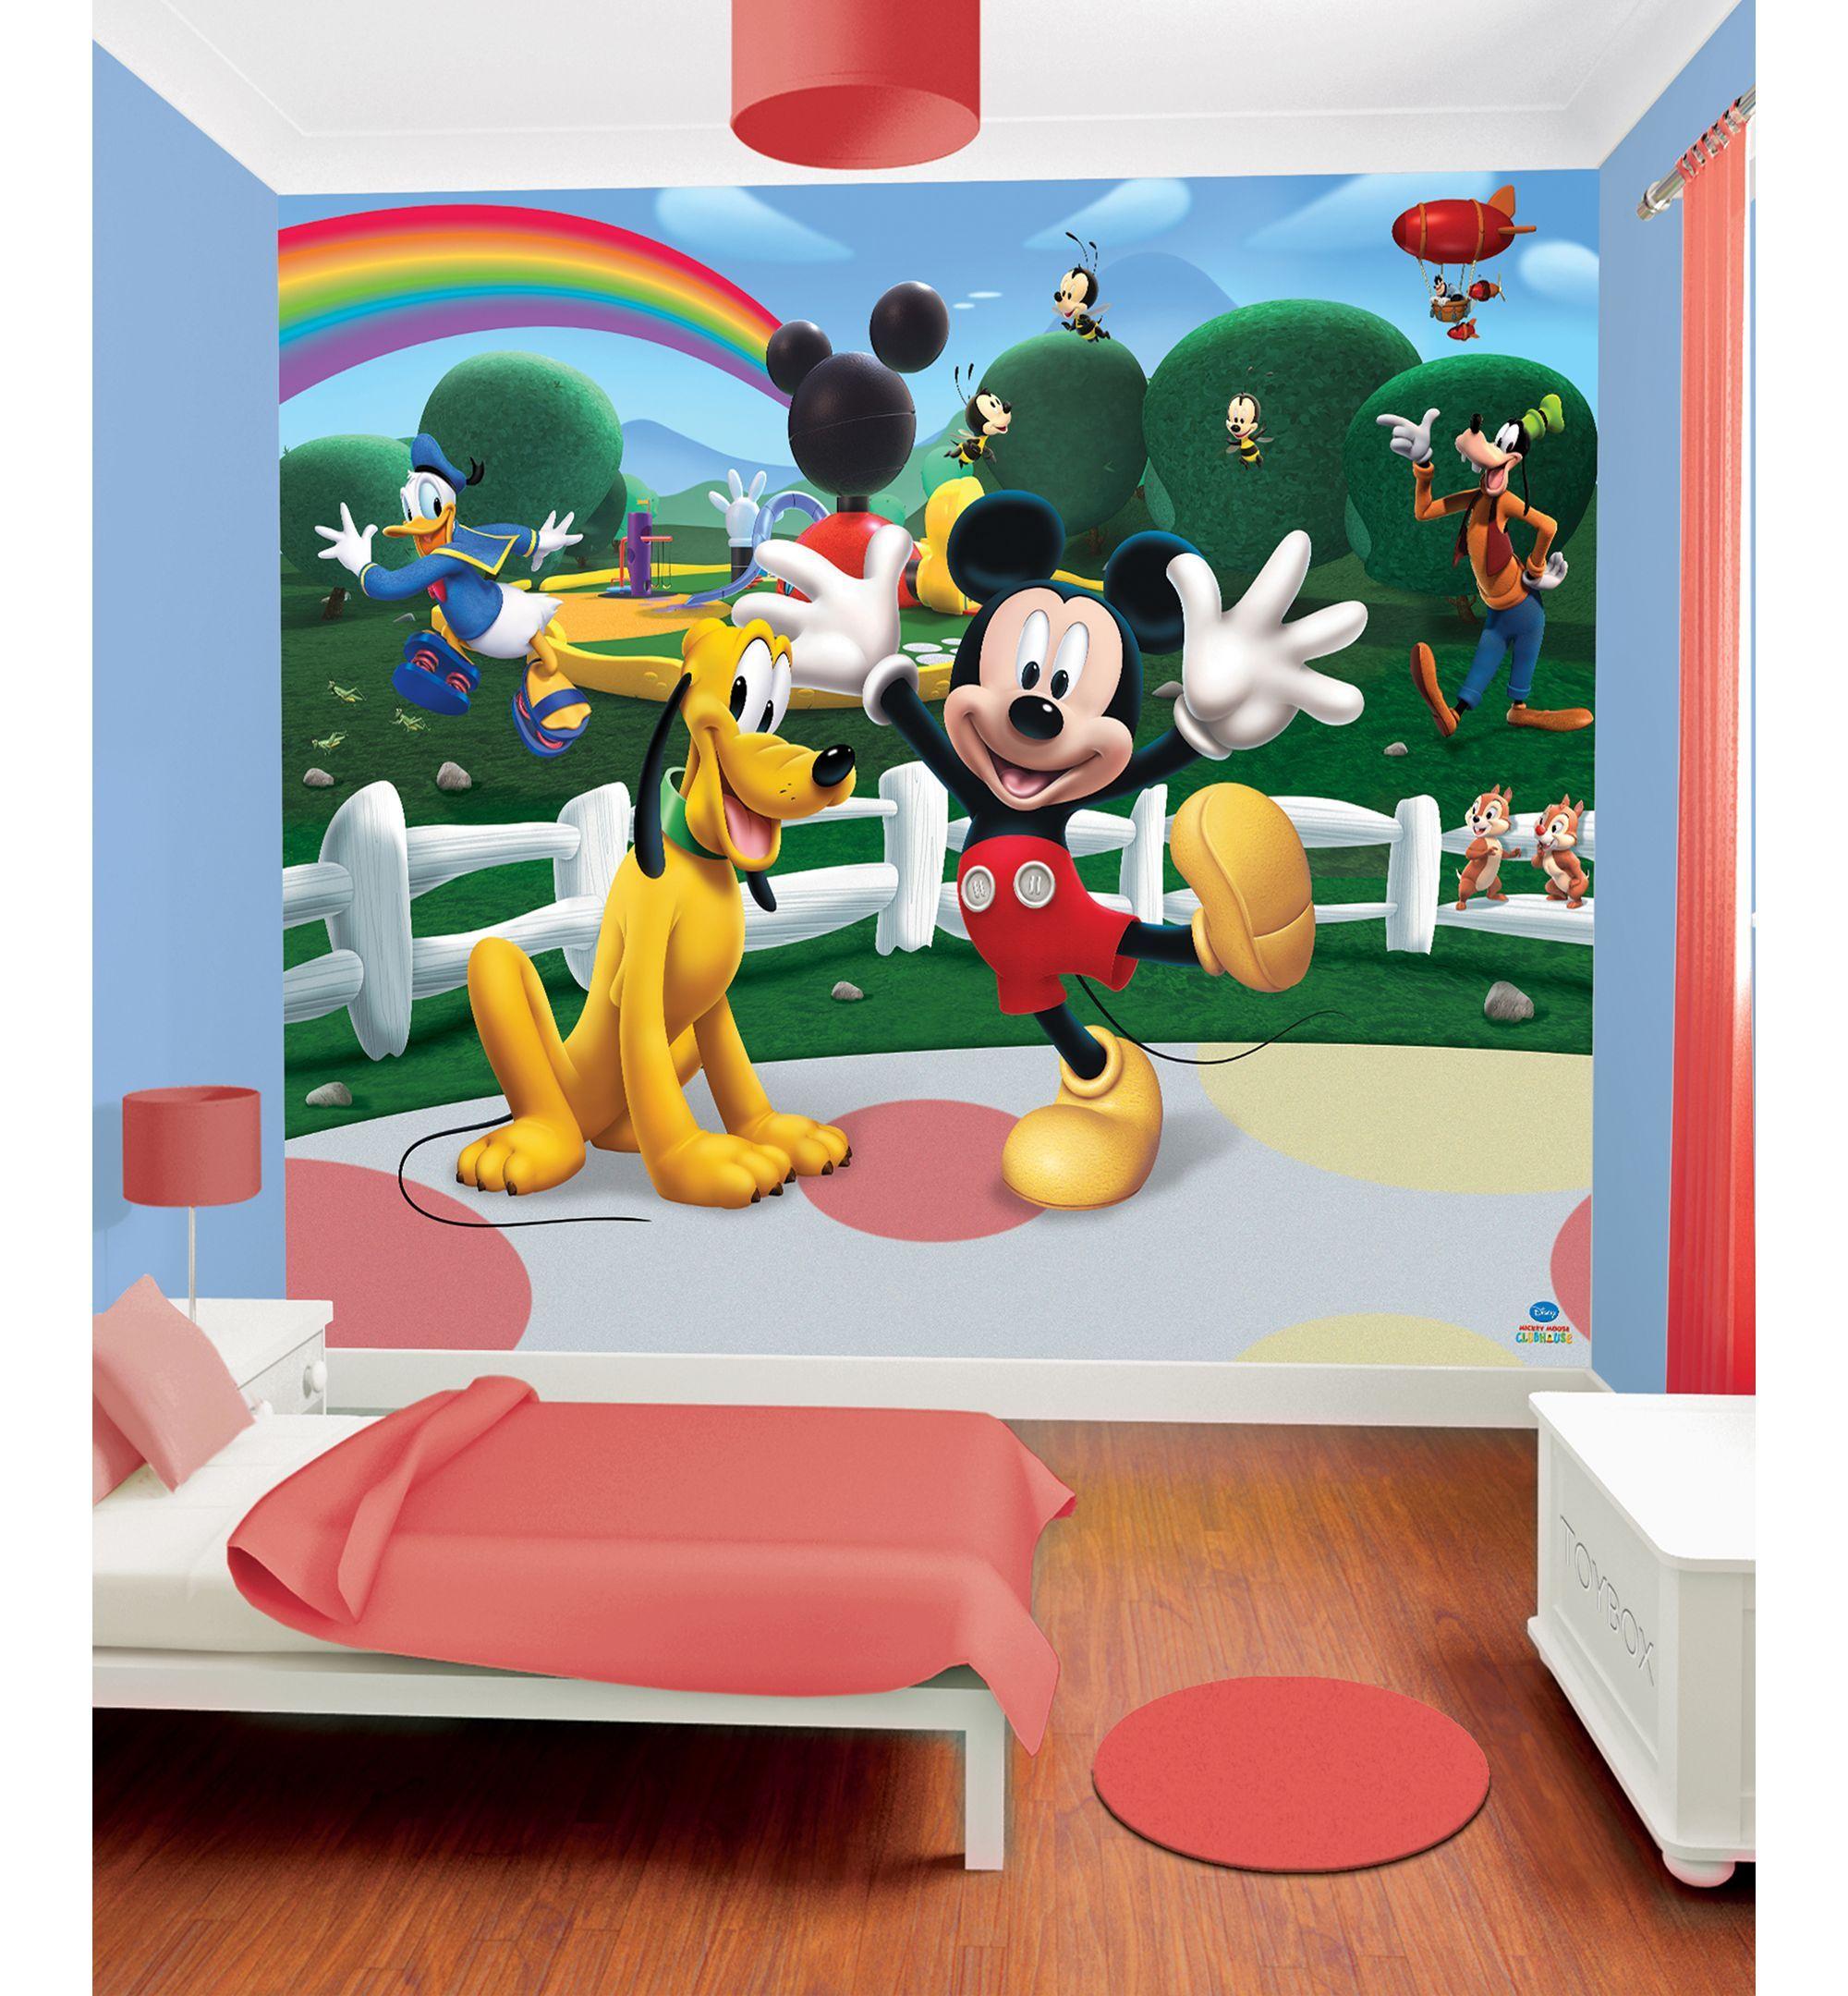 Nursery bedding bedroom ideas mickey mouse clubhouse - Mickey mouse clubhouse bedroom decor ...